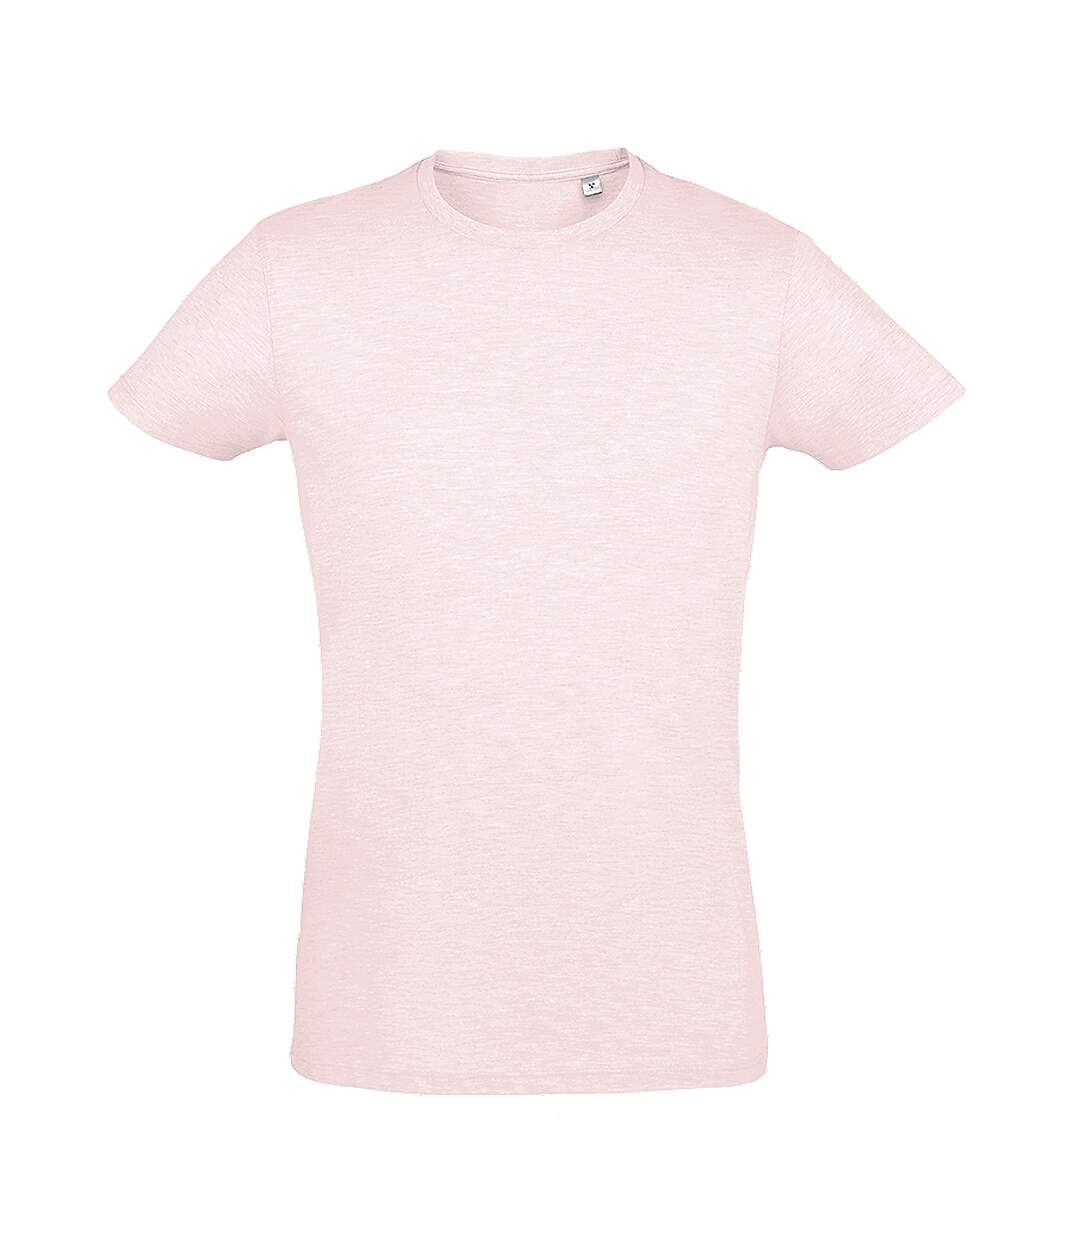 SOLS Mens Regent Slim Fit Short Sleeve T-Shirt (Heather Pink) - UTPC506